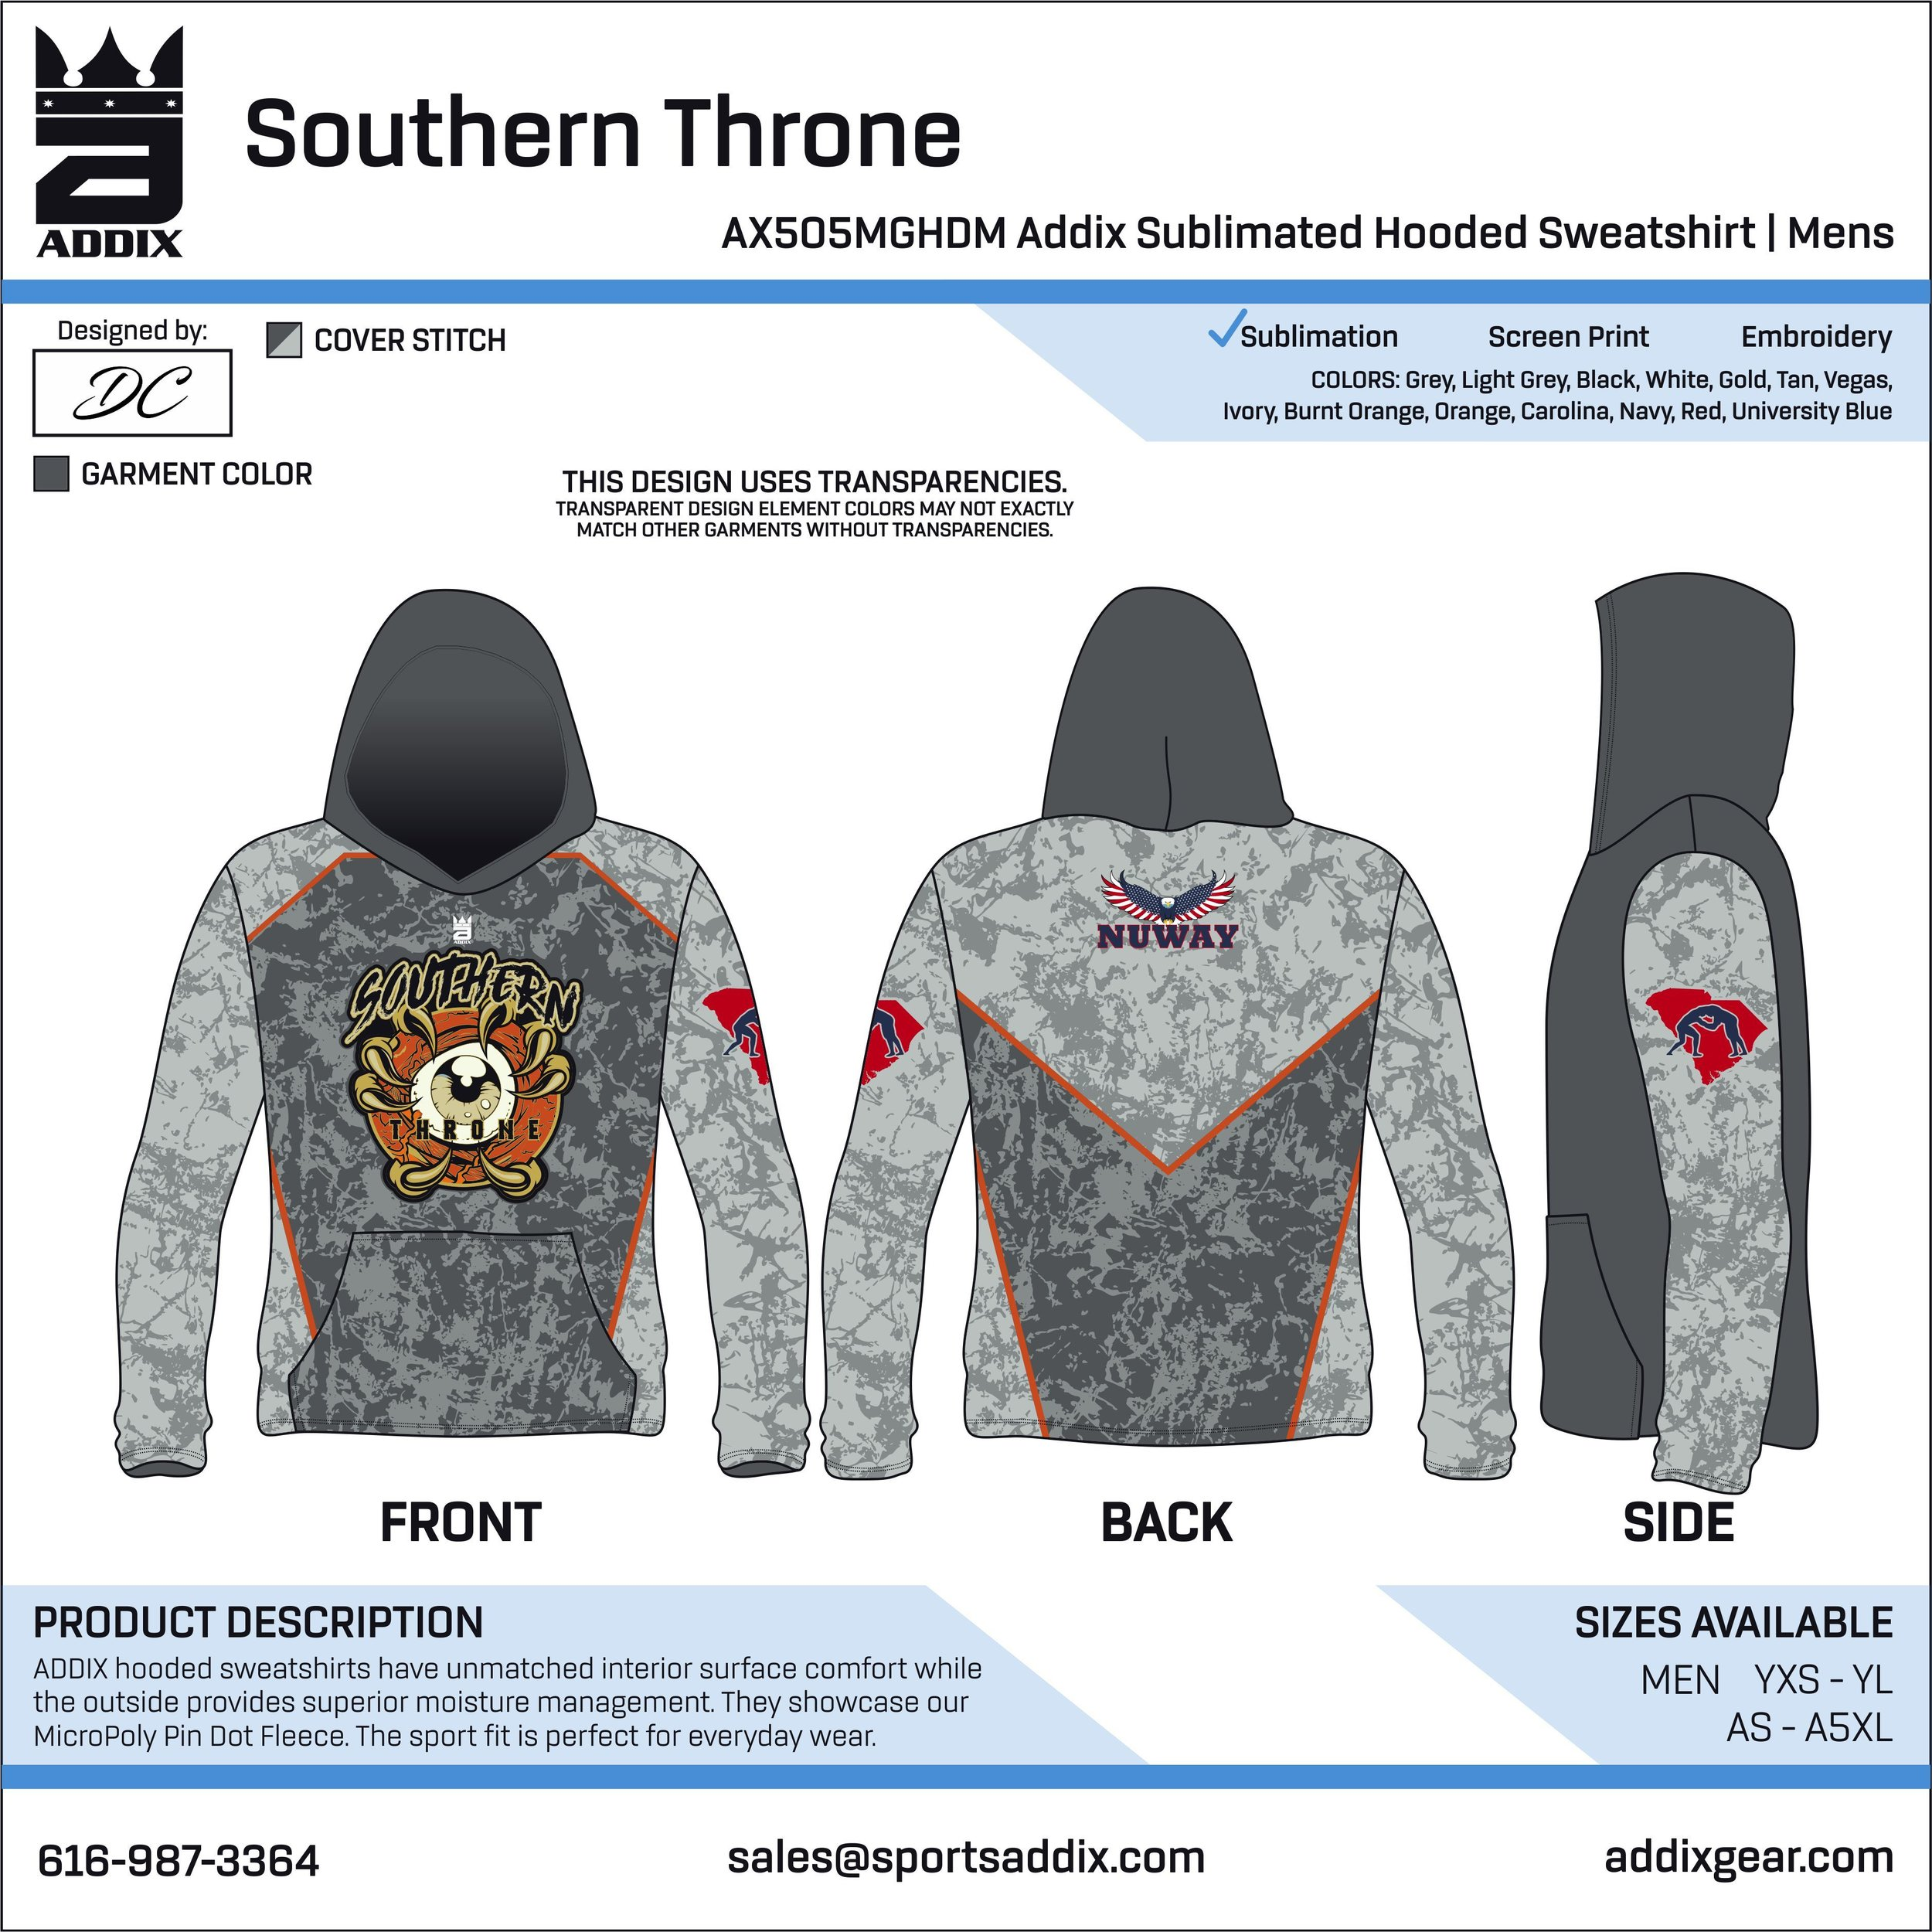 Southern Throne_2018_12-27_DC_FS Hoodie v2.jpg